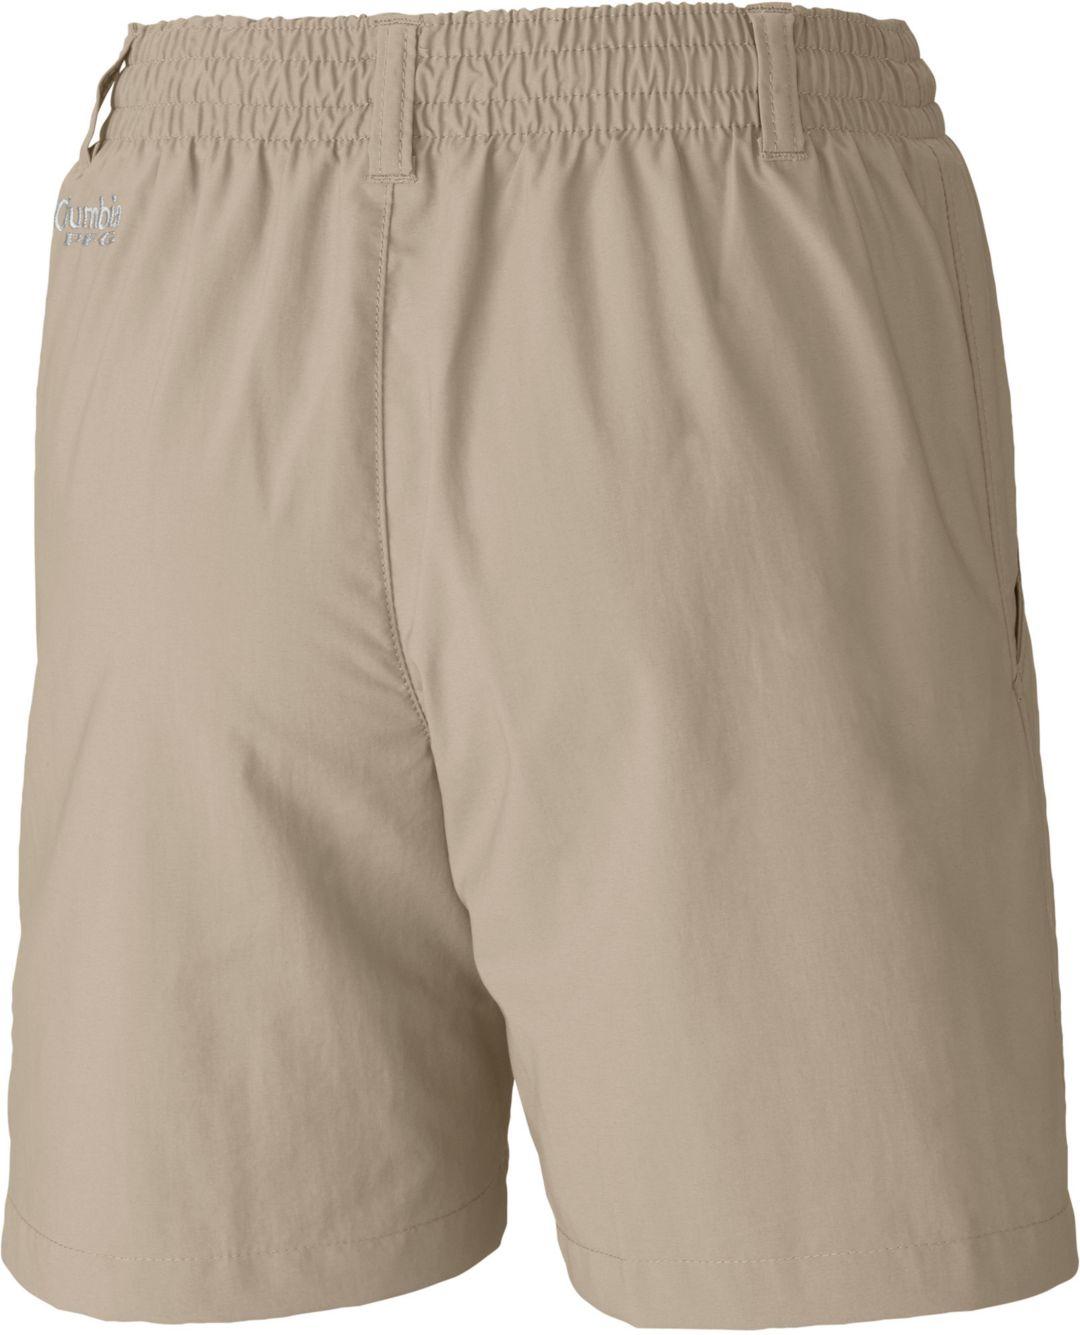 b7e805d82 Columbia Boys' PFG Backcast Shorts | DICK'S Sporting Goods